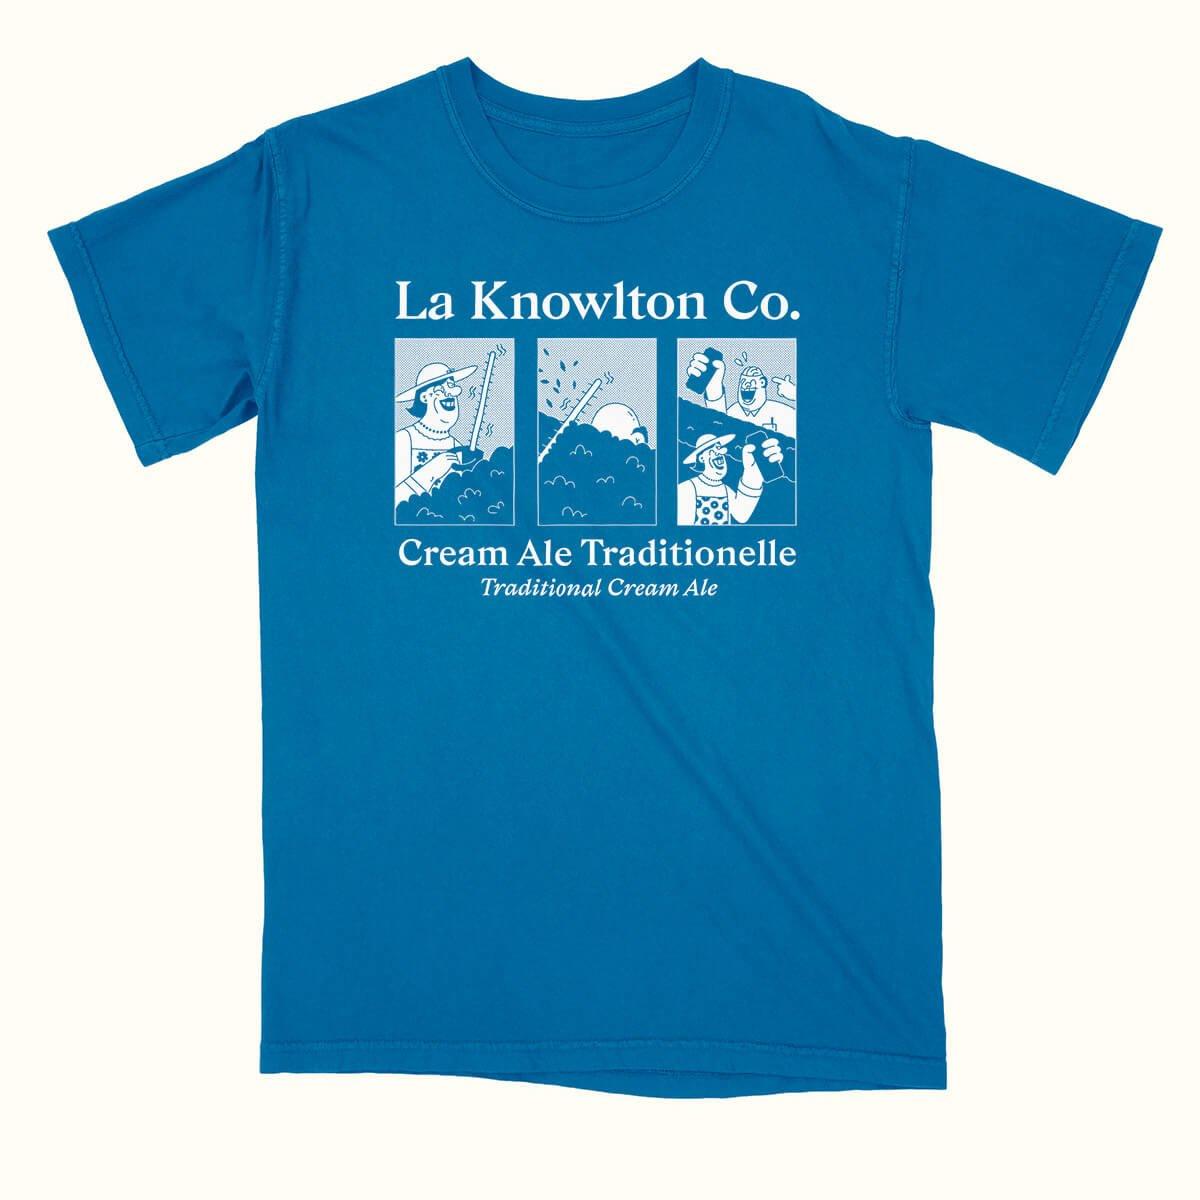 Blue Cream Ale T-Shirt - La Knowlton Co.